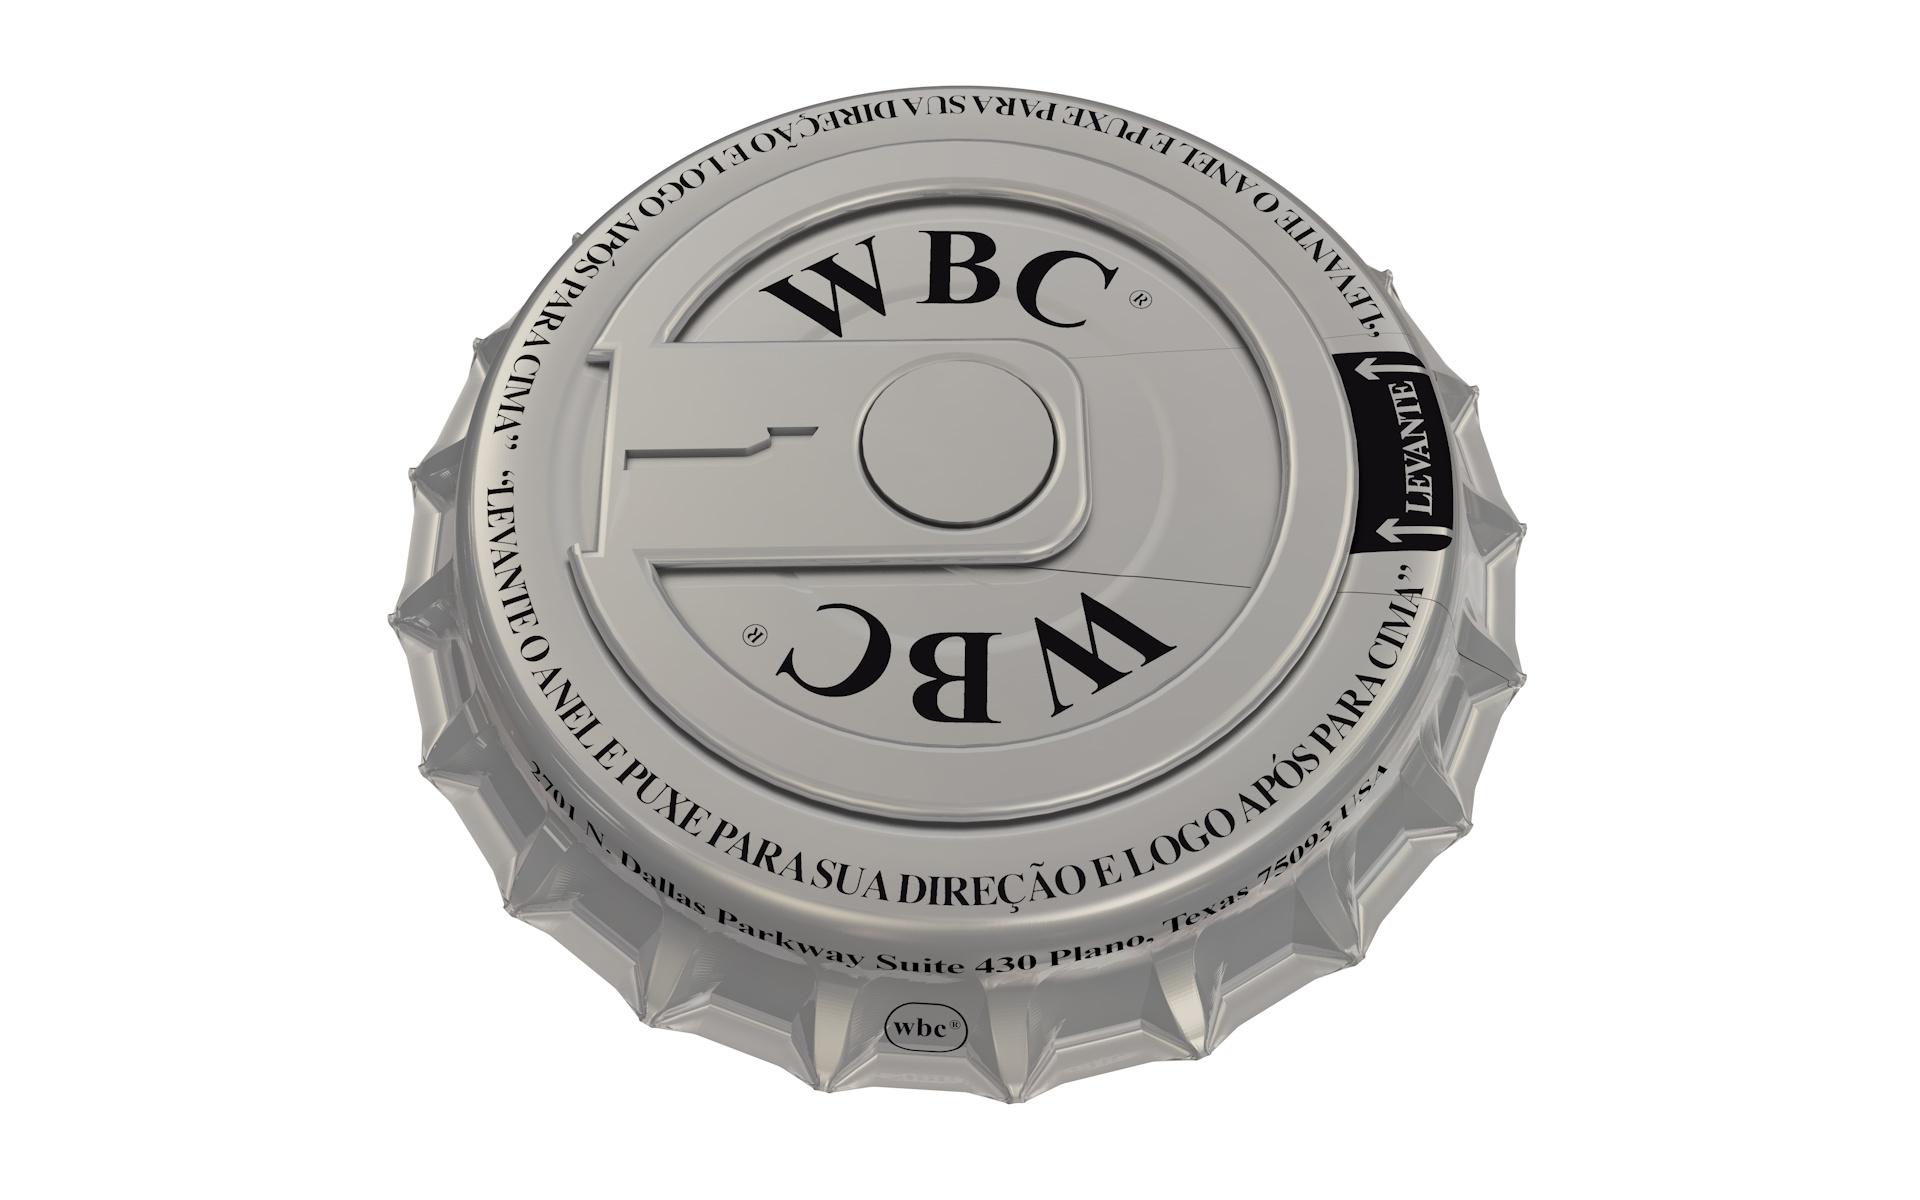 epbc-wbc-lift-ar-por-001_0000